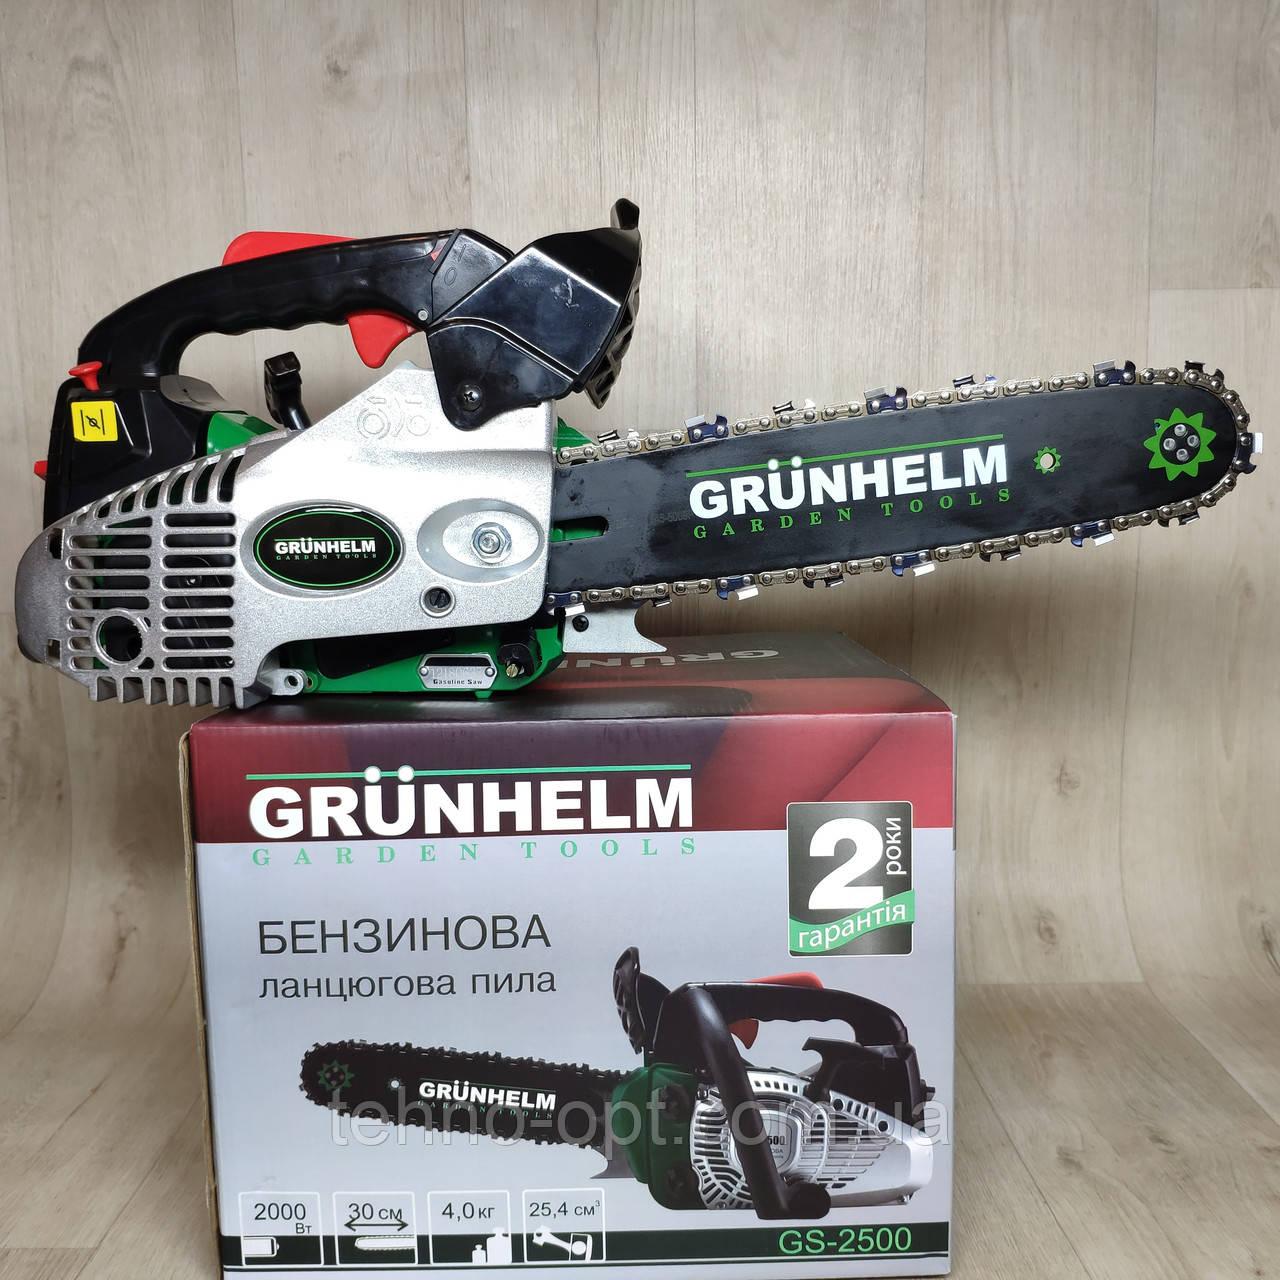 Одноручная маленькая  Бензопила Grunhelm GS-2500 Сучкорез